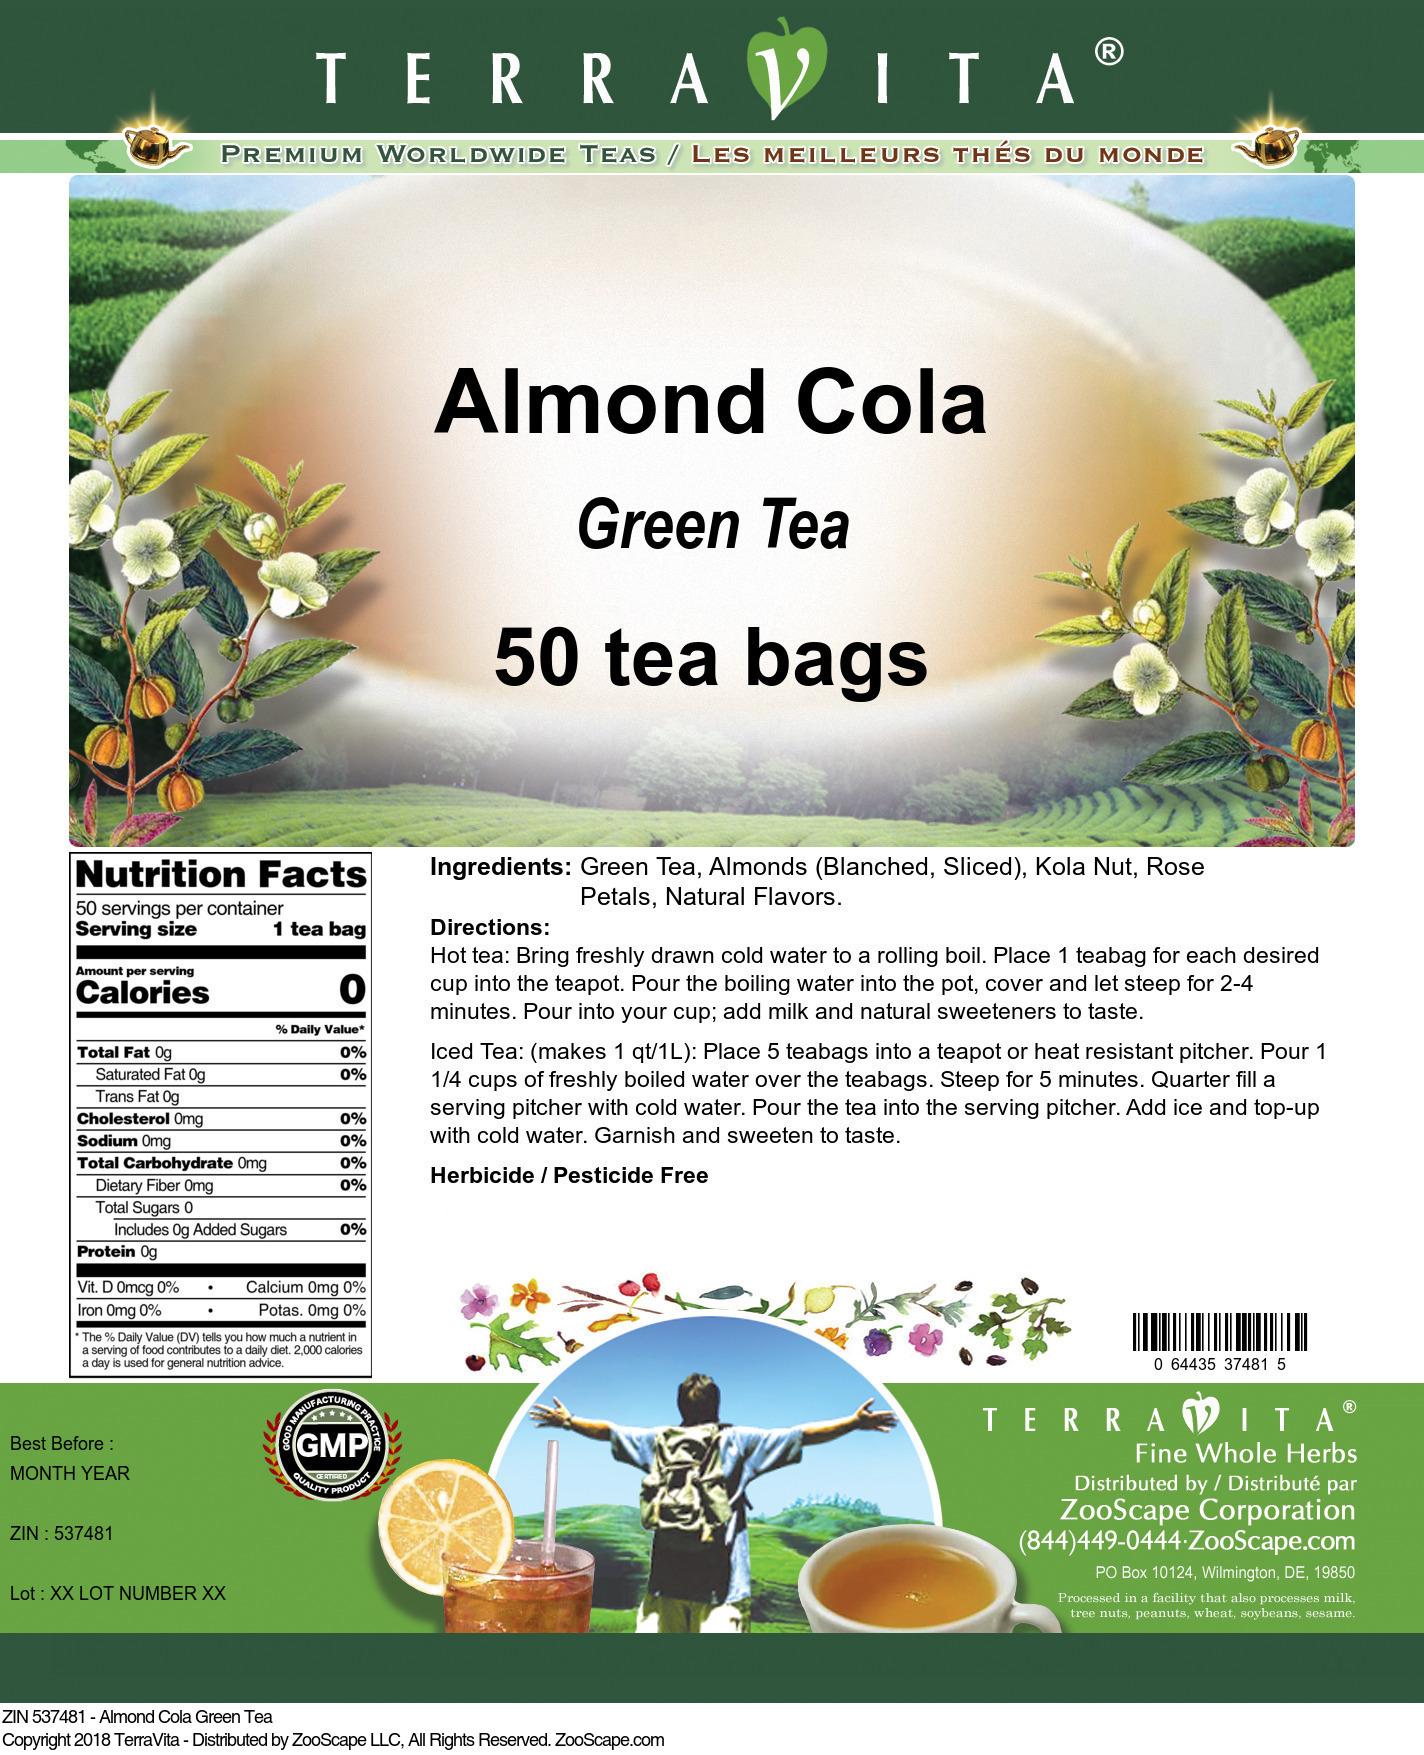 Almond Cola Green Tea